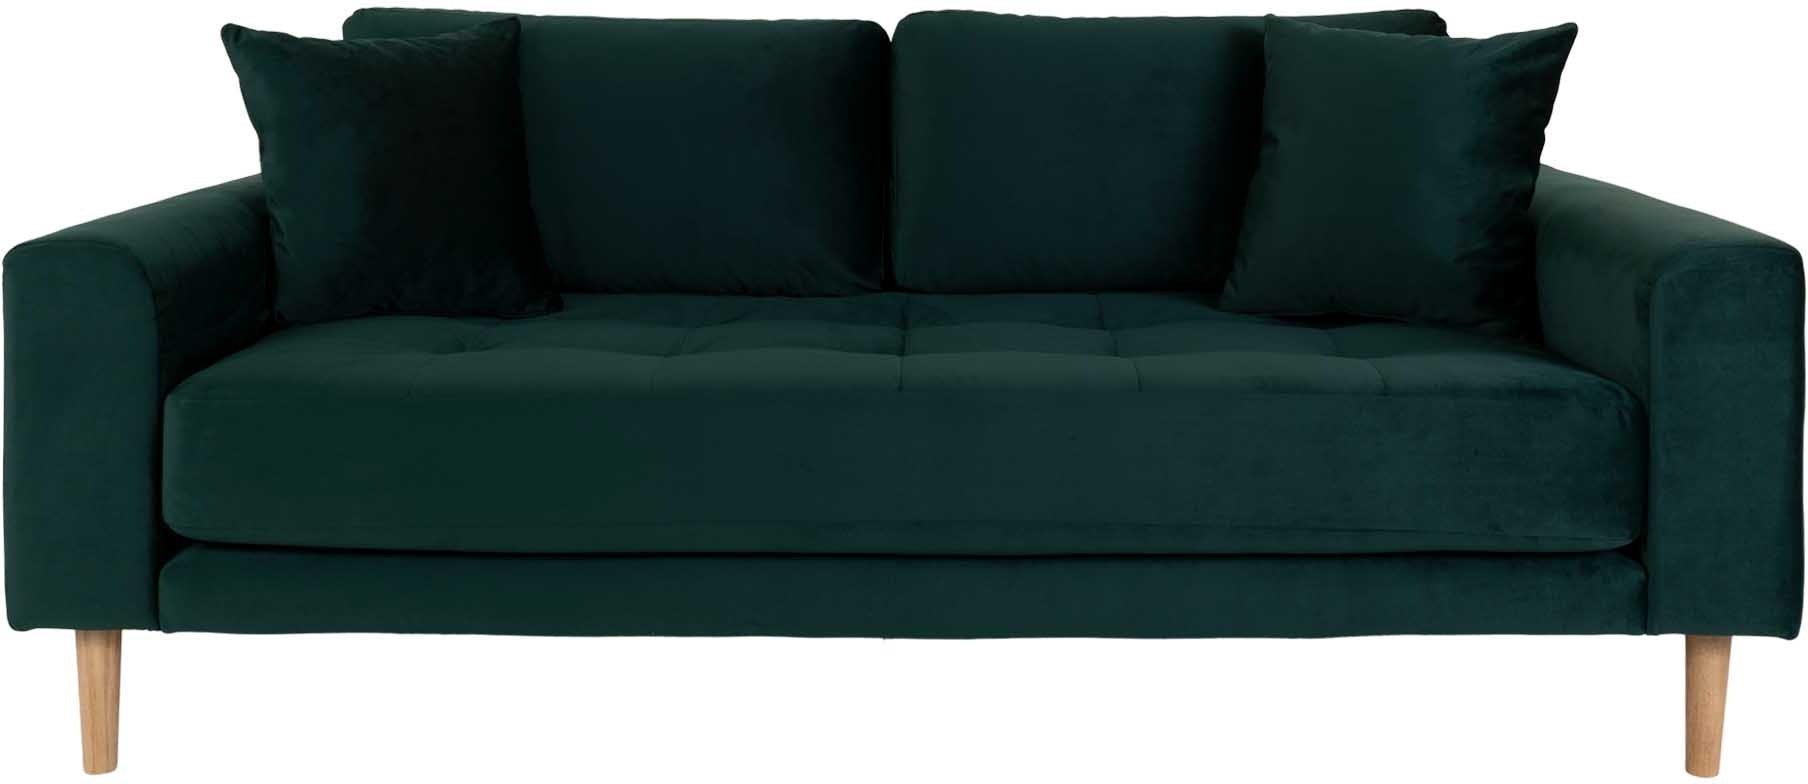 Lido, 2,5-personers sofa, Velour by Nordby (H: 76 cm. B: 180 cm. L: 93 cm., Mørkegrøn)